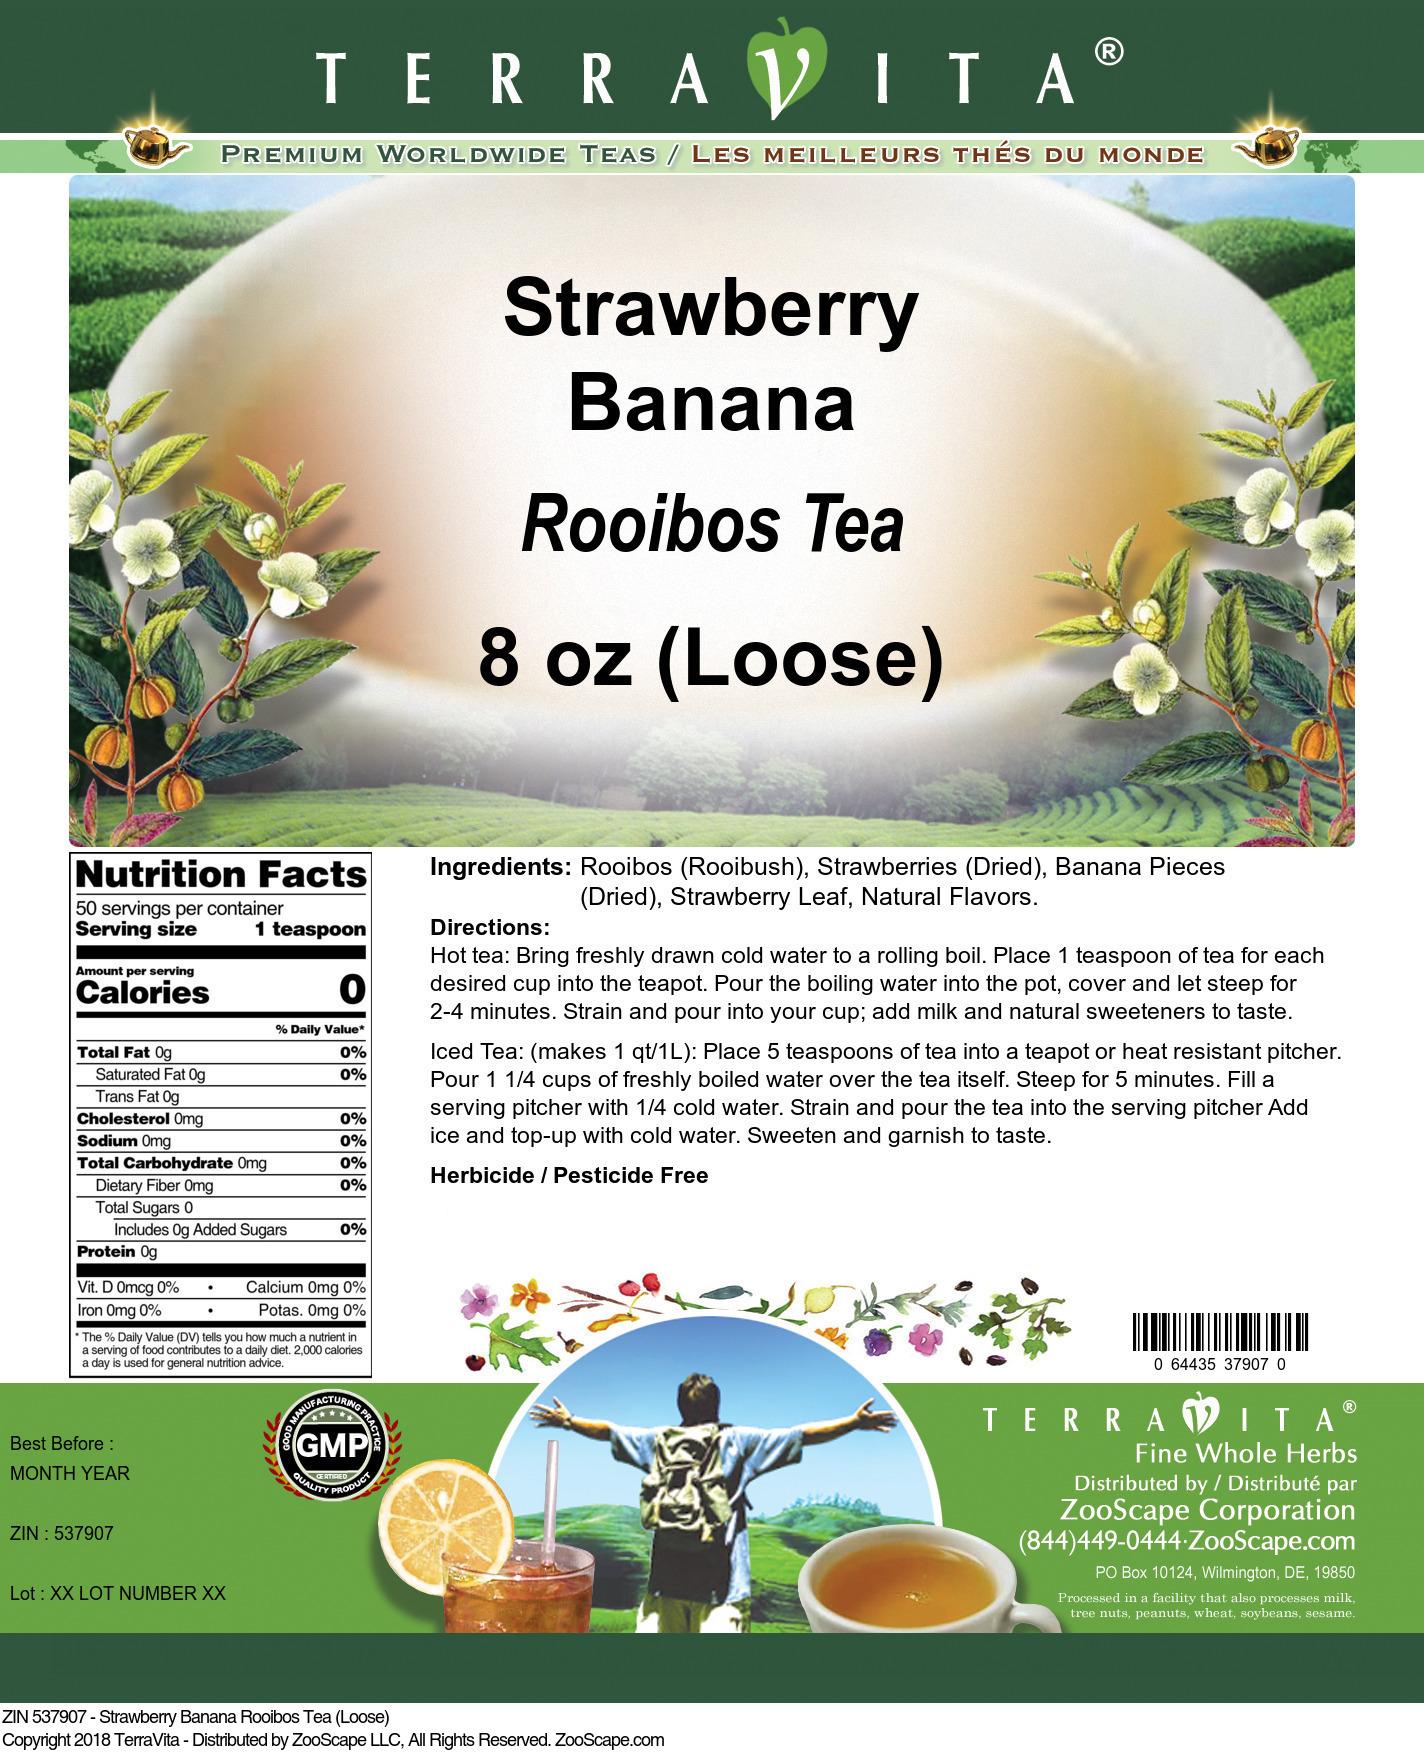 Strawberry Banana Rooibos Tea